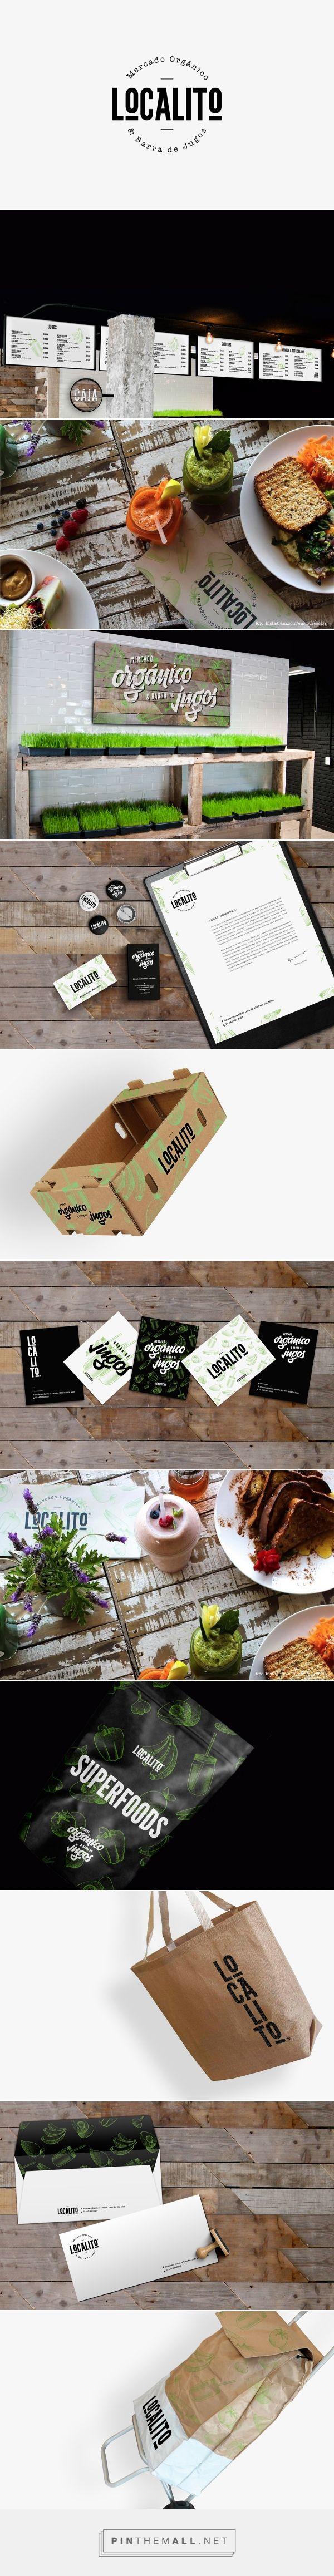 LOCALITO on Behance | Fivestar Branding – Design and Branding Agency & Inspiration Gallery